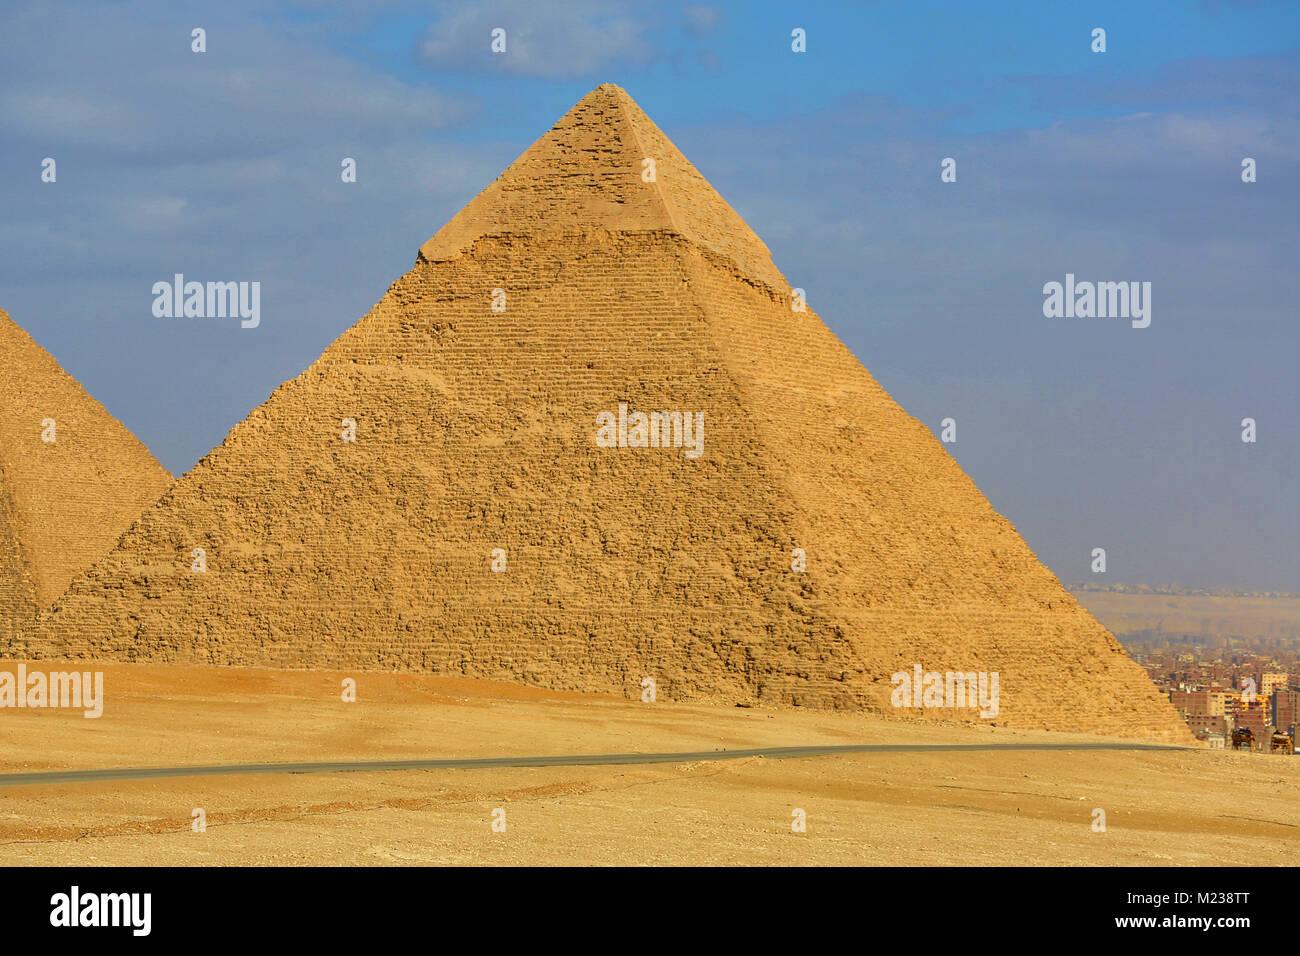 La pirámide de Khafre (o Chephren) en la meseta de Giza, Cairo, Egipto Imagen De Stock